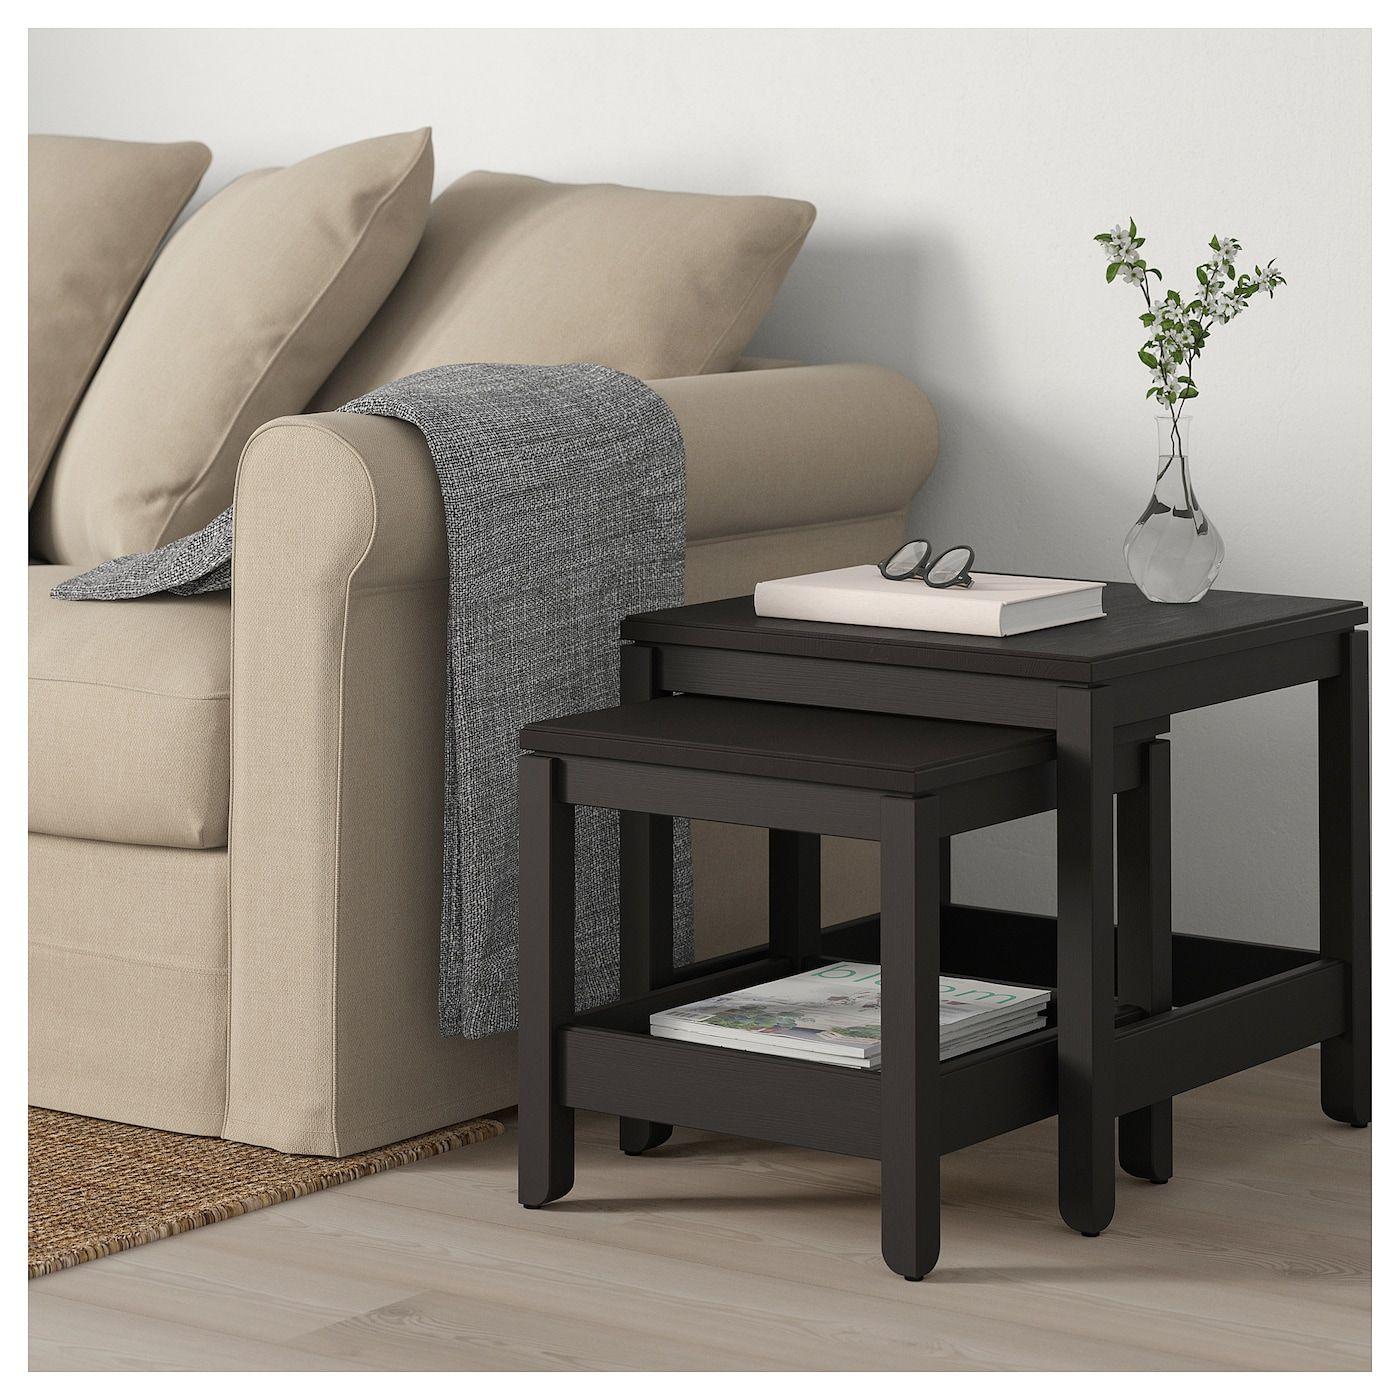 Havsta Nesting Tables Set Of 2 Dark Brown Ikea Beige Sofa Living Room Nesting Tables Ikea